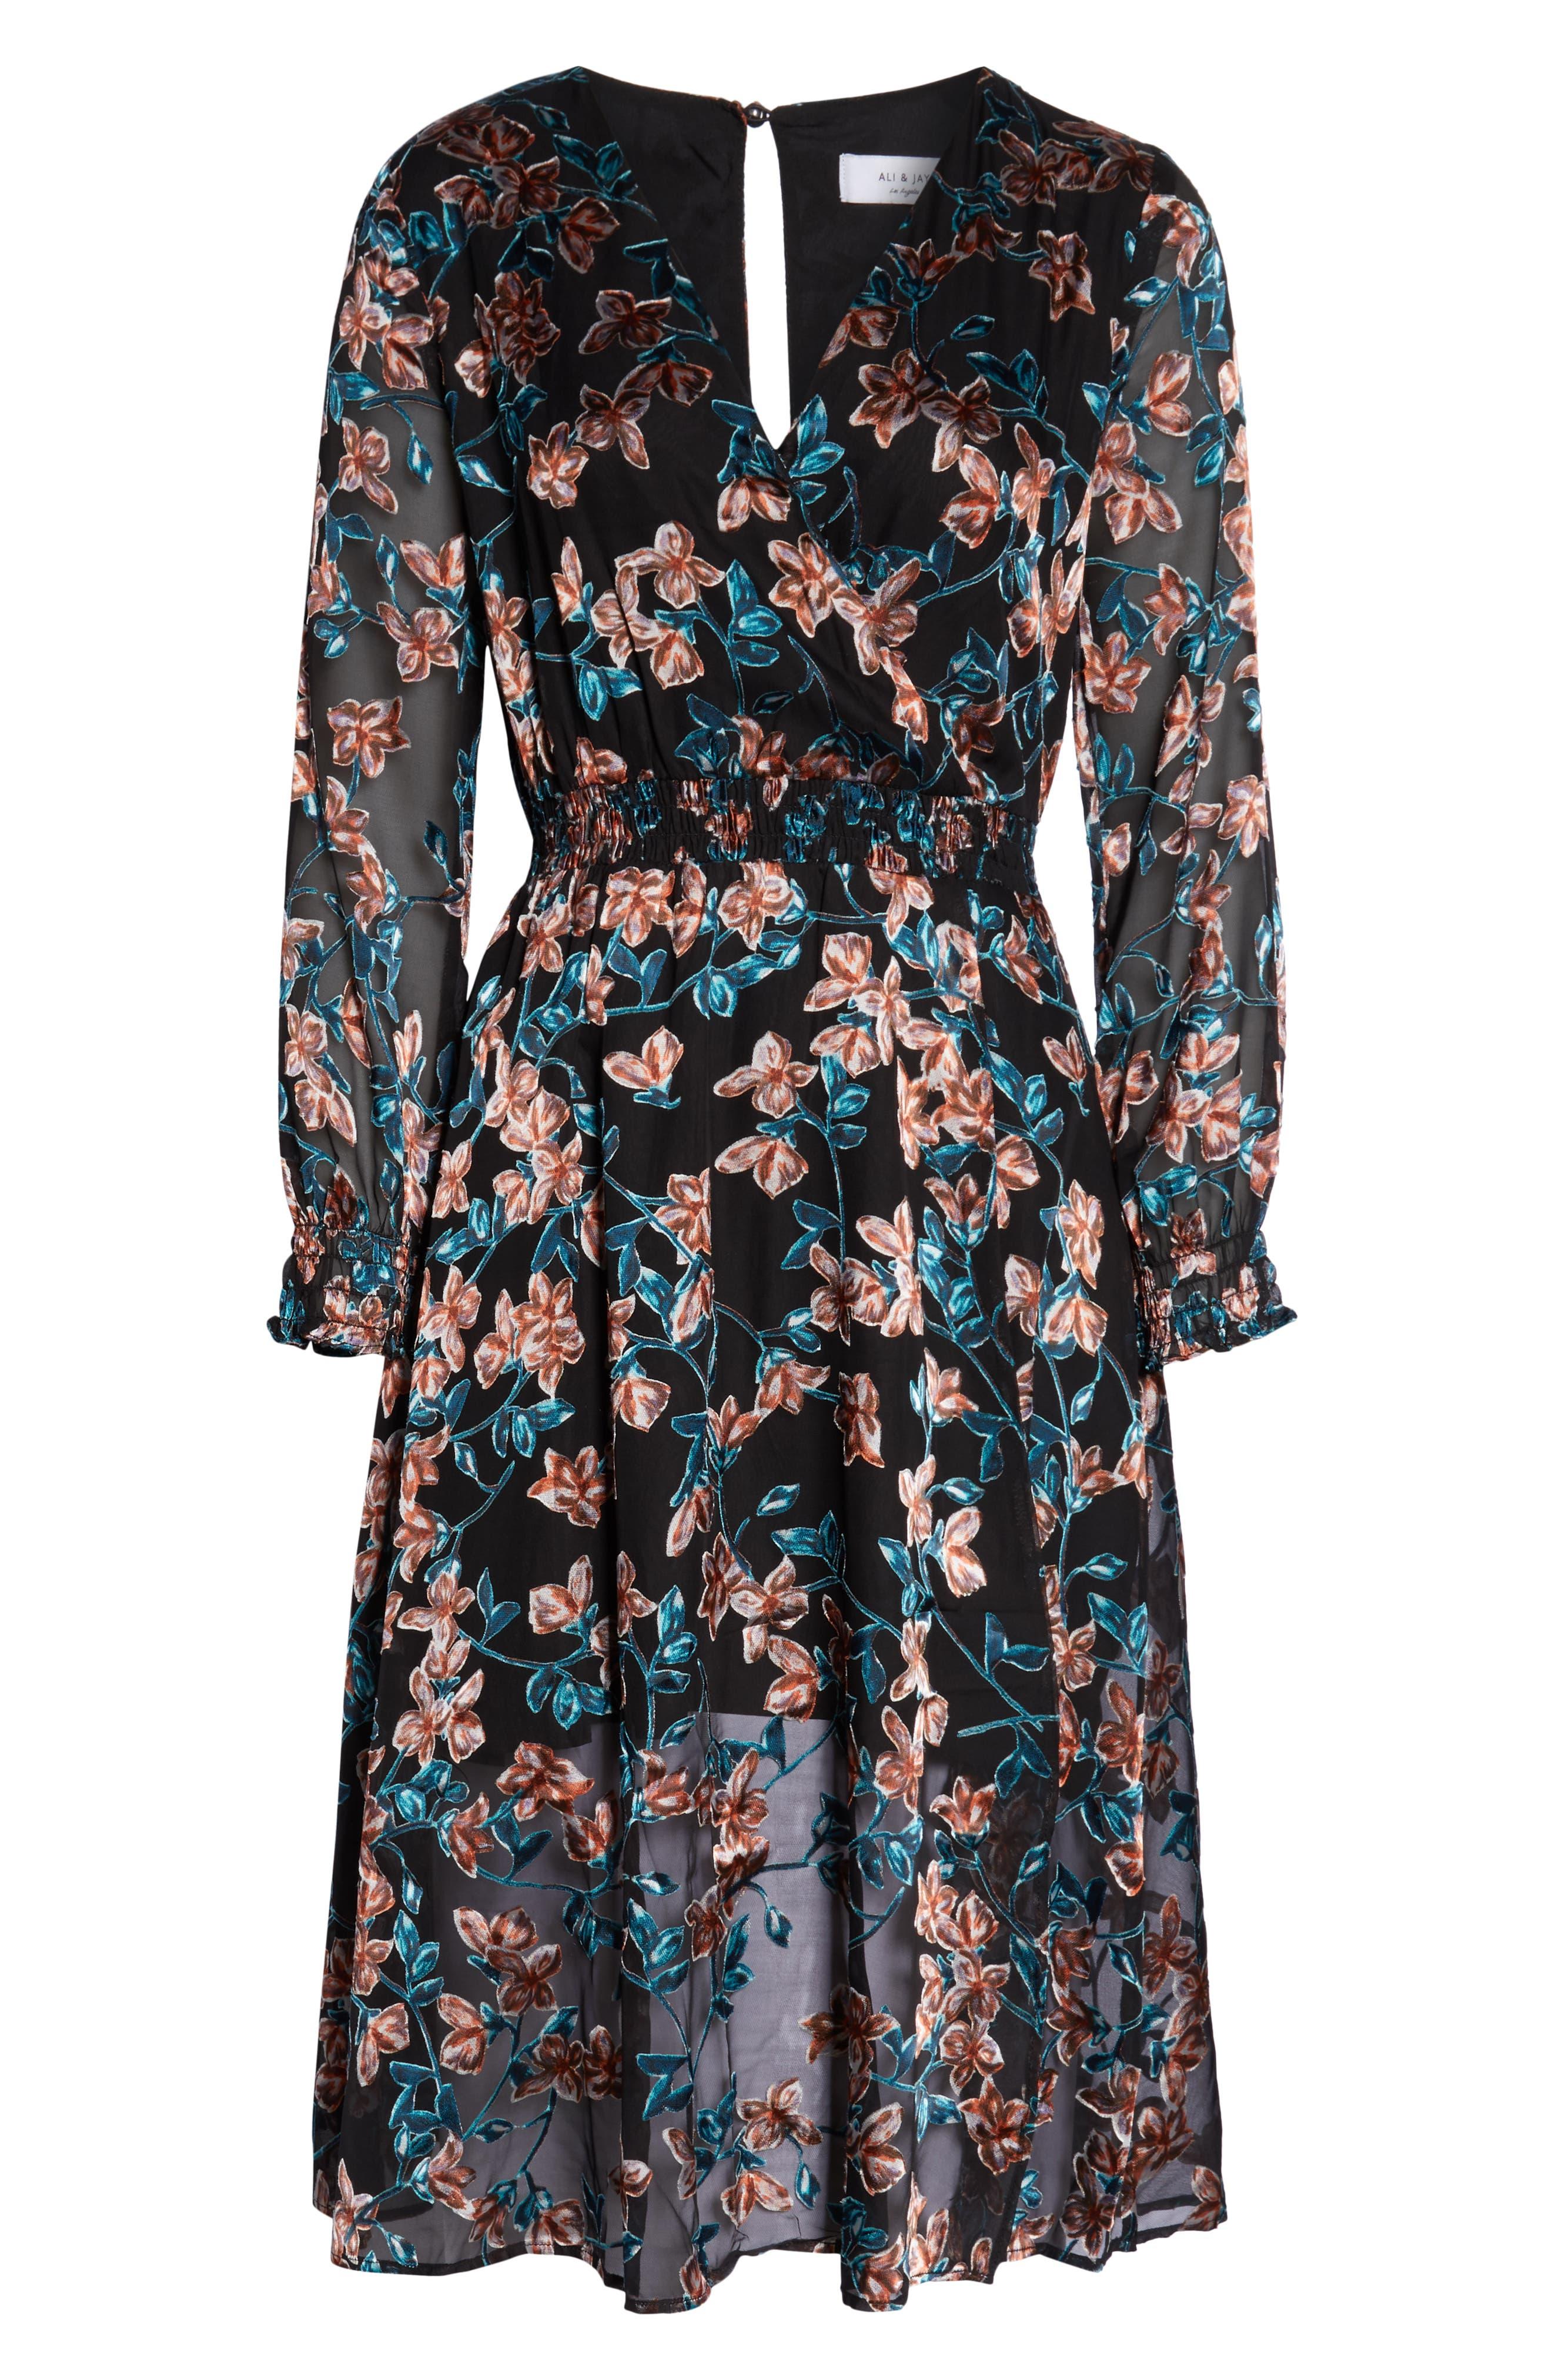 ALI & JAY,                             Treat Me Like a Lady Floral Dress,                             Alternate thumbnail 7, color,                             FLORAL BURNOUT